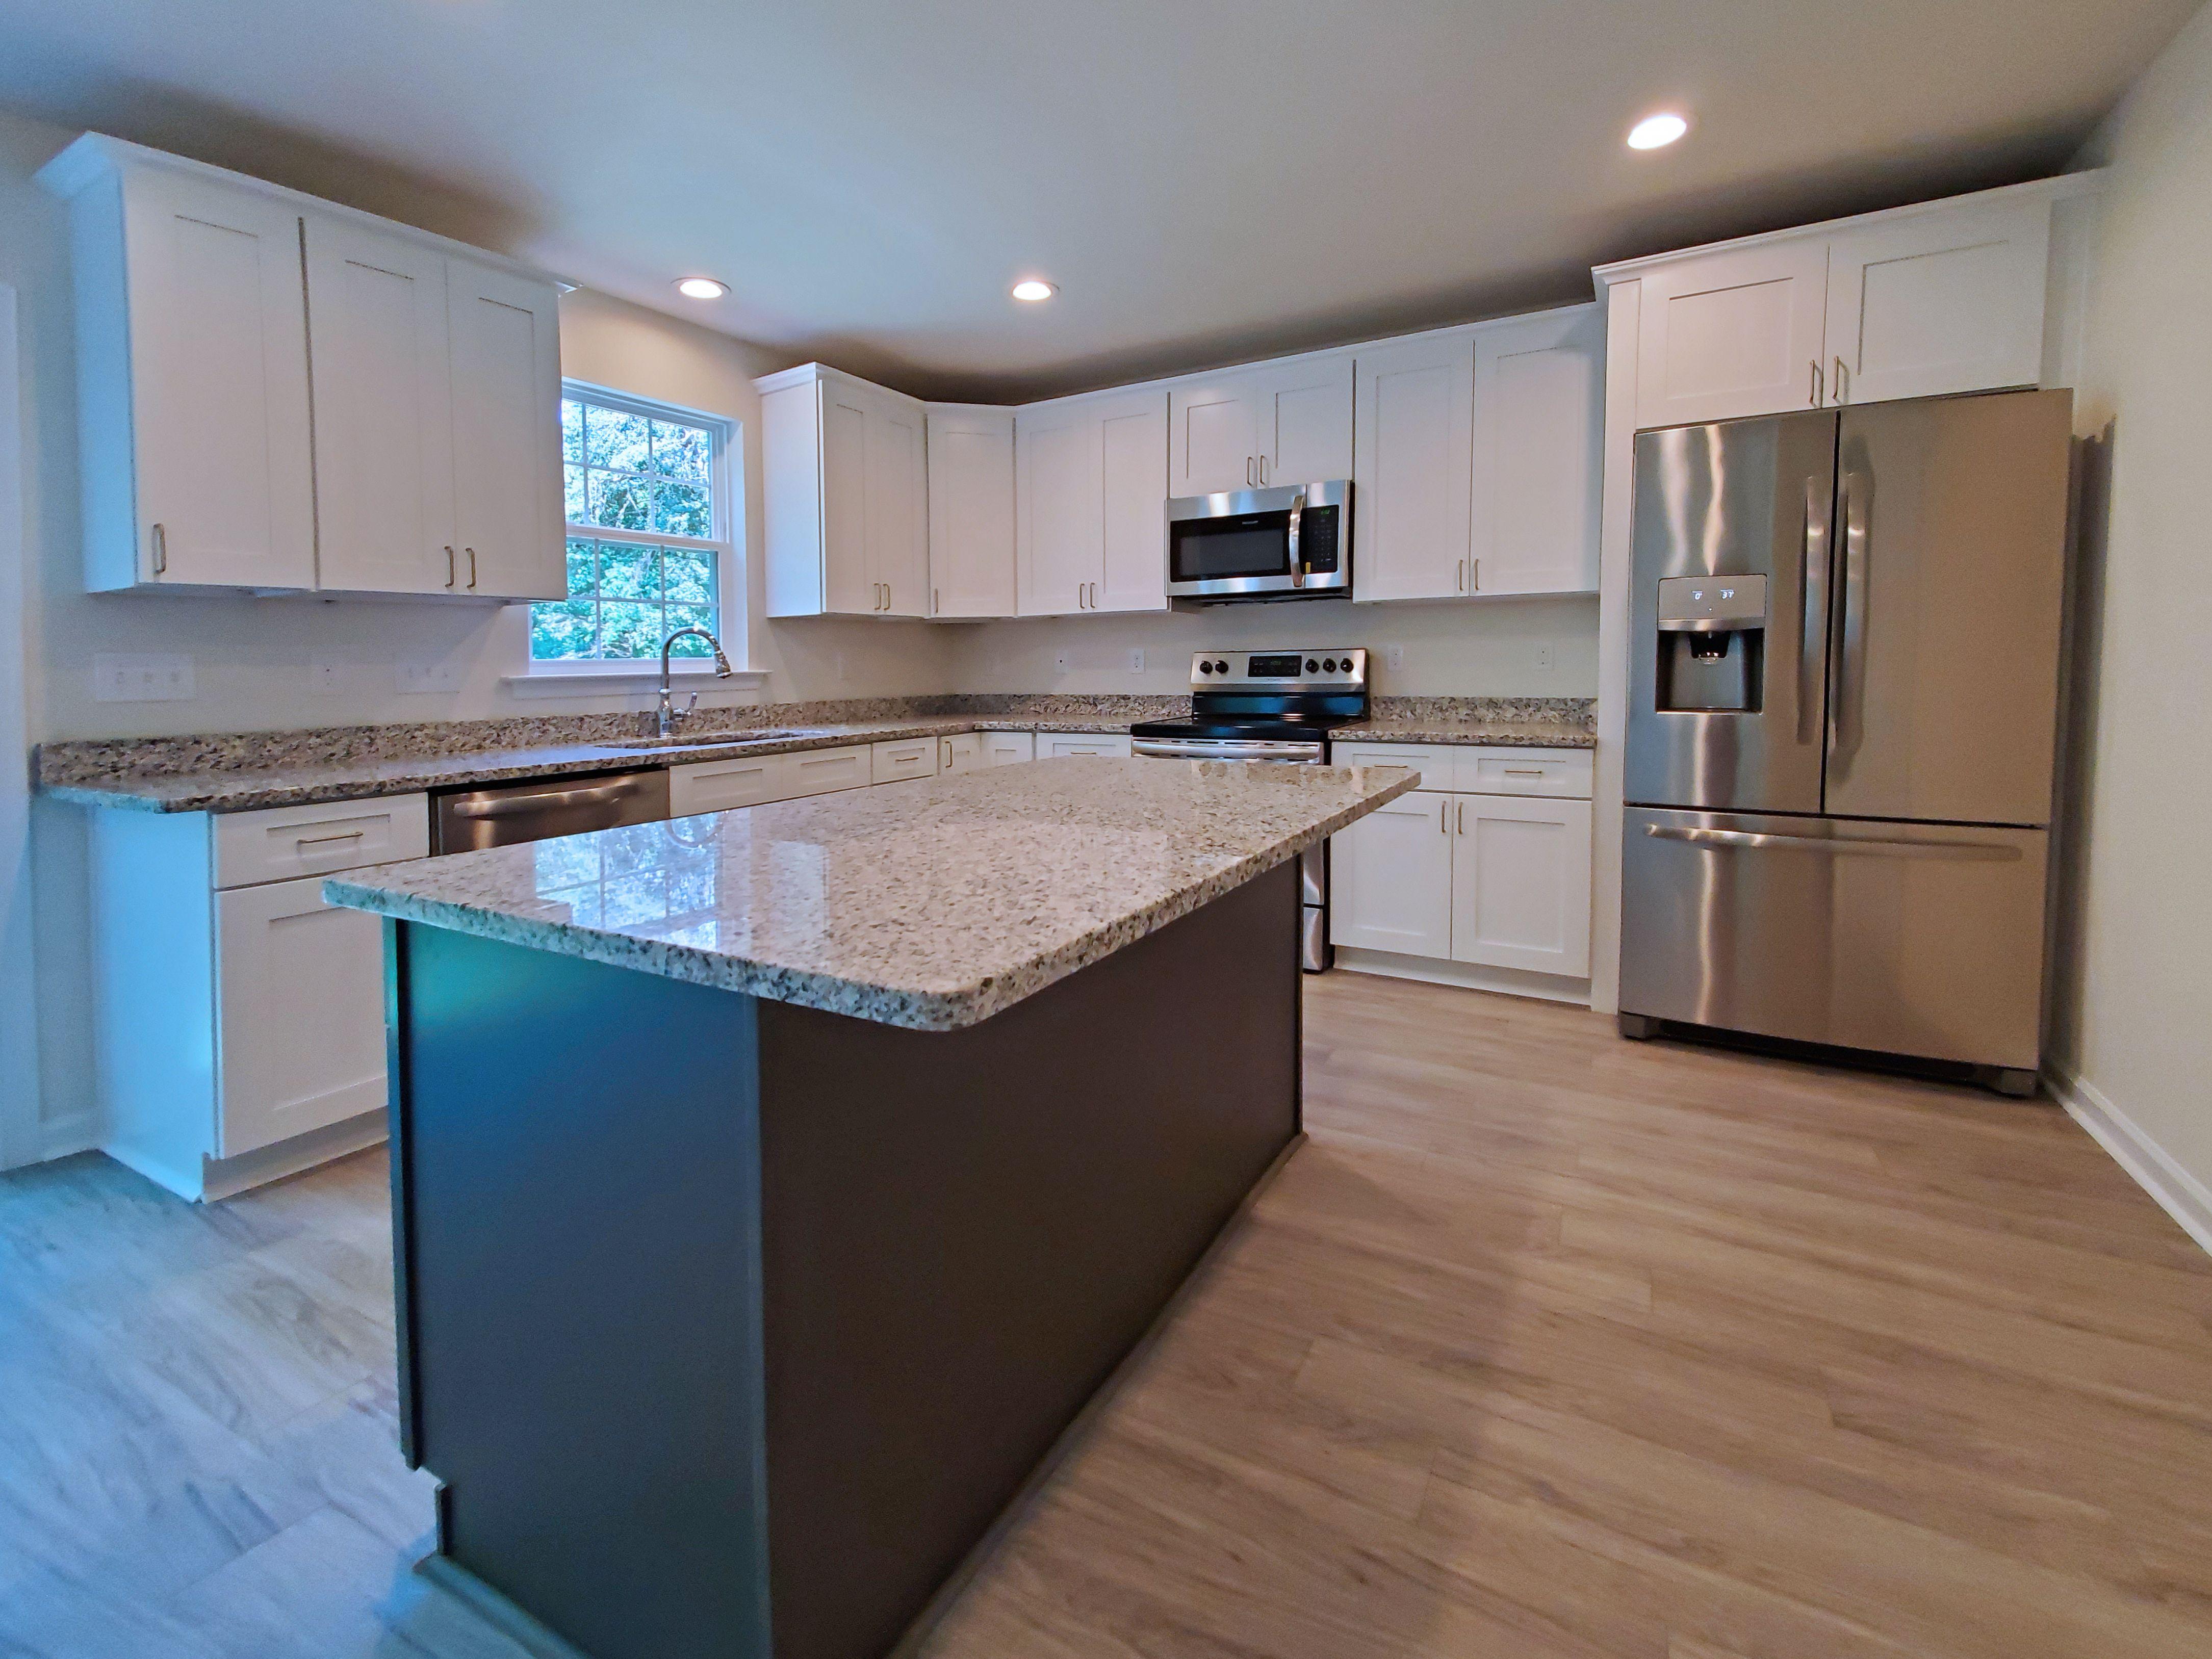 Kitchen featured in the Brewer By Dannex Construction in Washington, VA